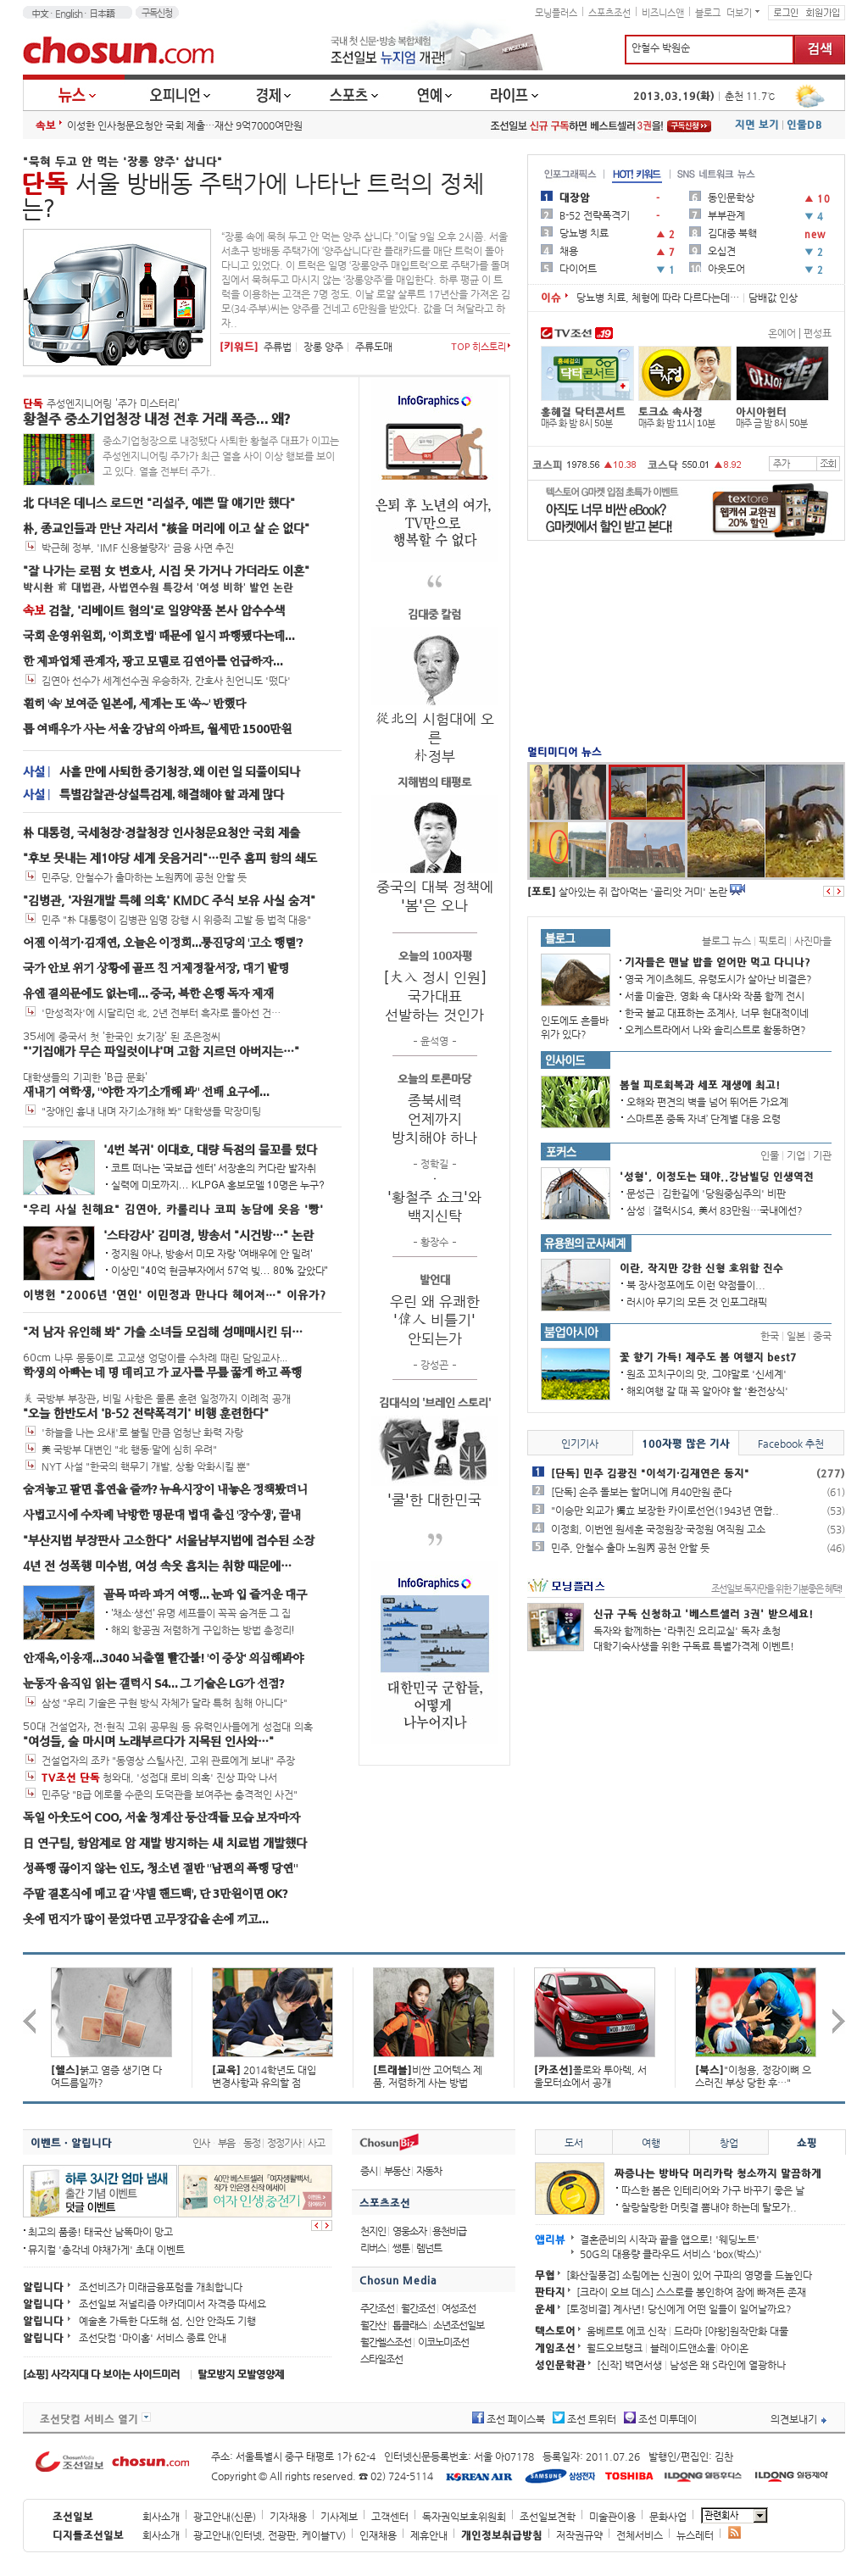 chosun.com at Tuesday March 19, 2013, 10:04 a.m. UTC